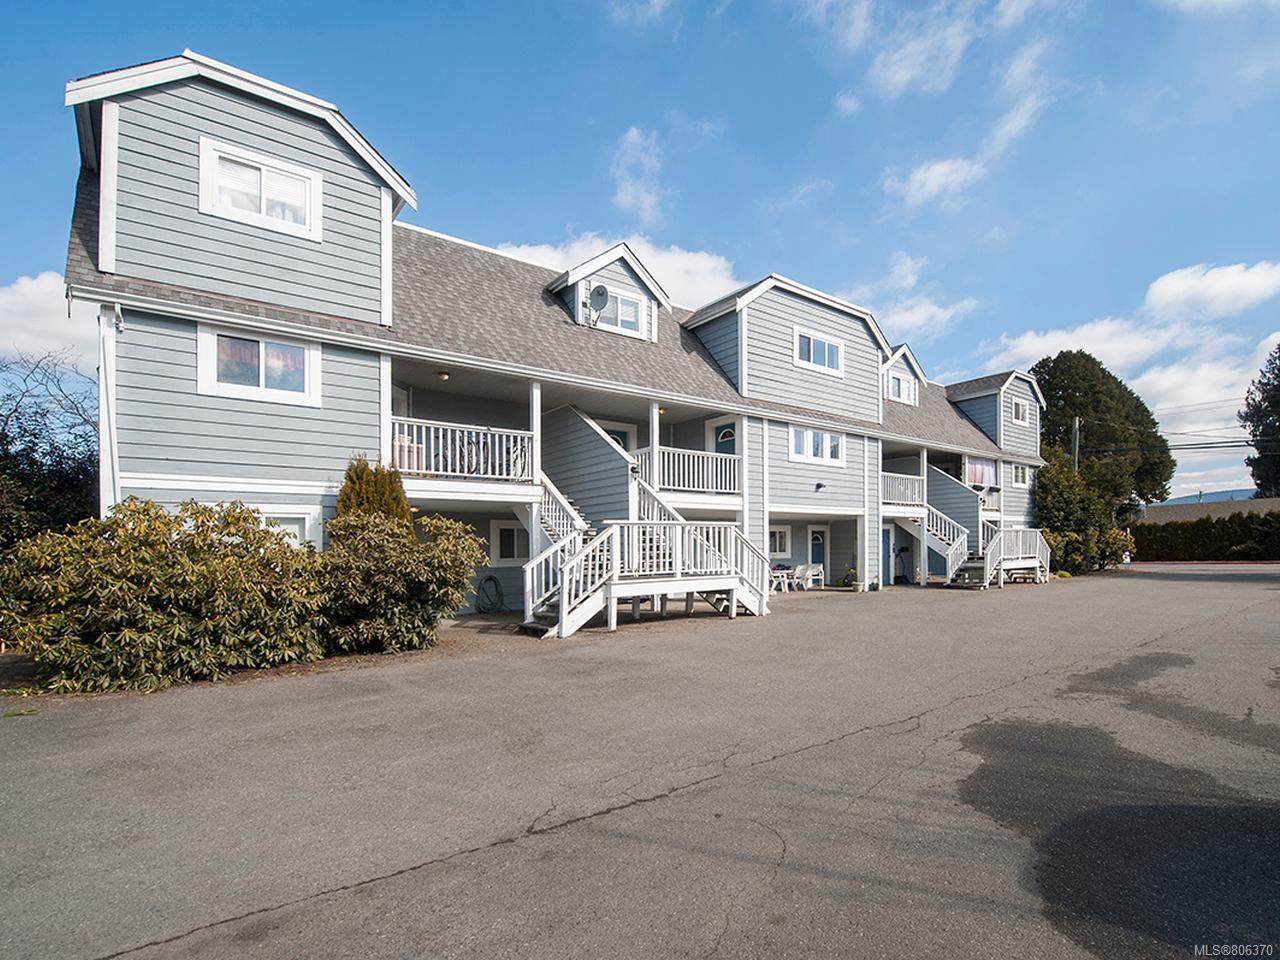 Main Photo: 7 5788 Howard Ave in DUNCAN: Du East Duncan Row/Townhouse for sale (Duncan)  : MLS®# 806370